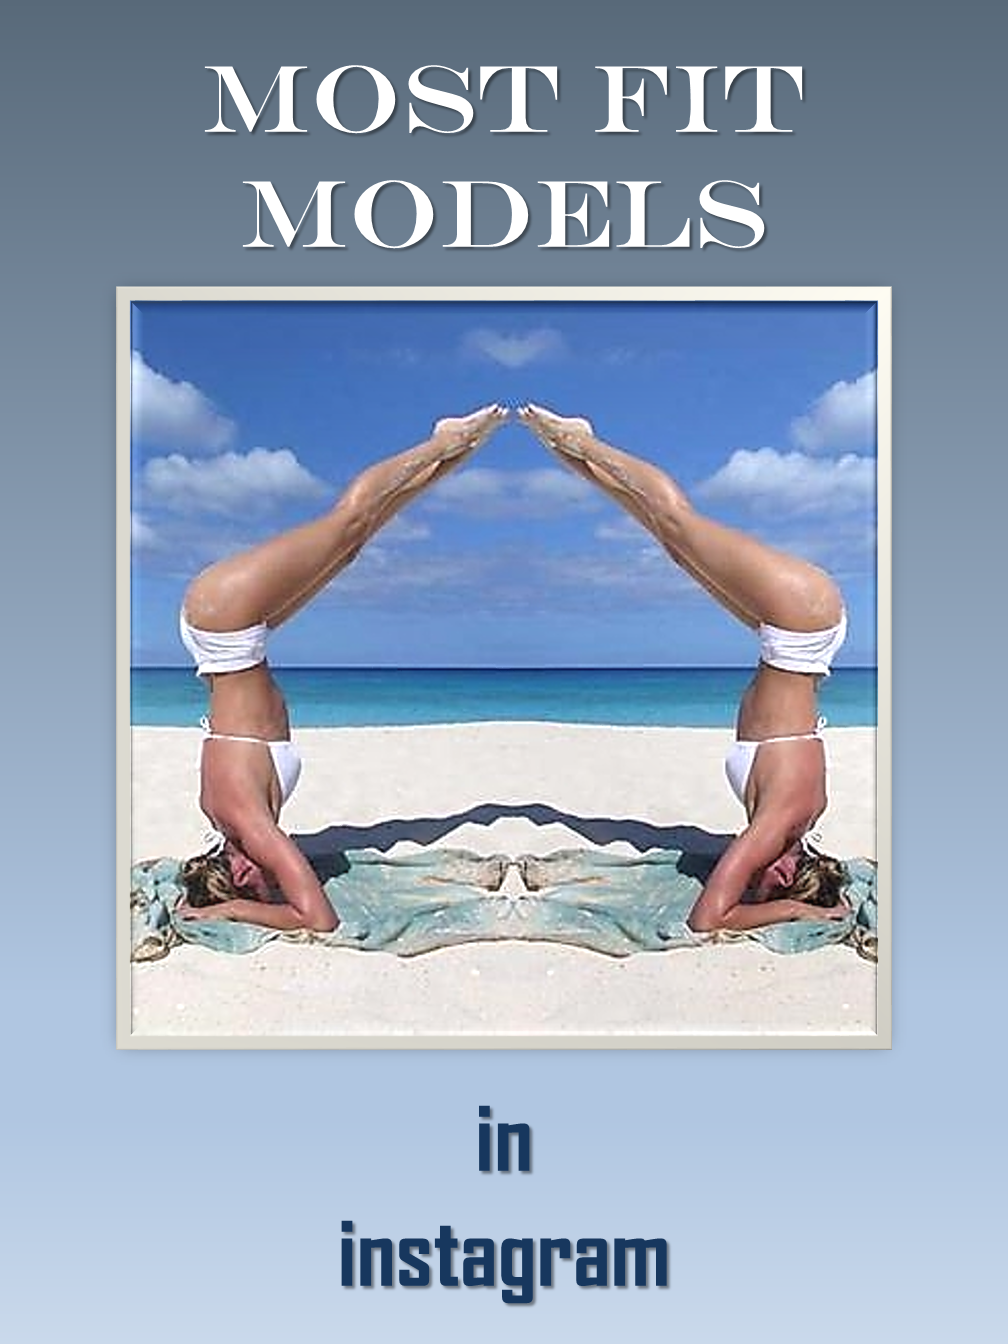 Most Fit Instagram Models